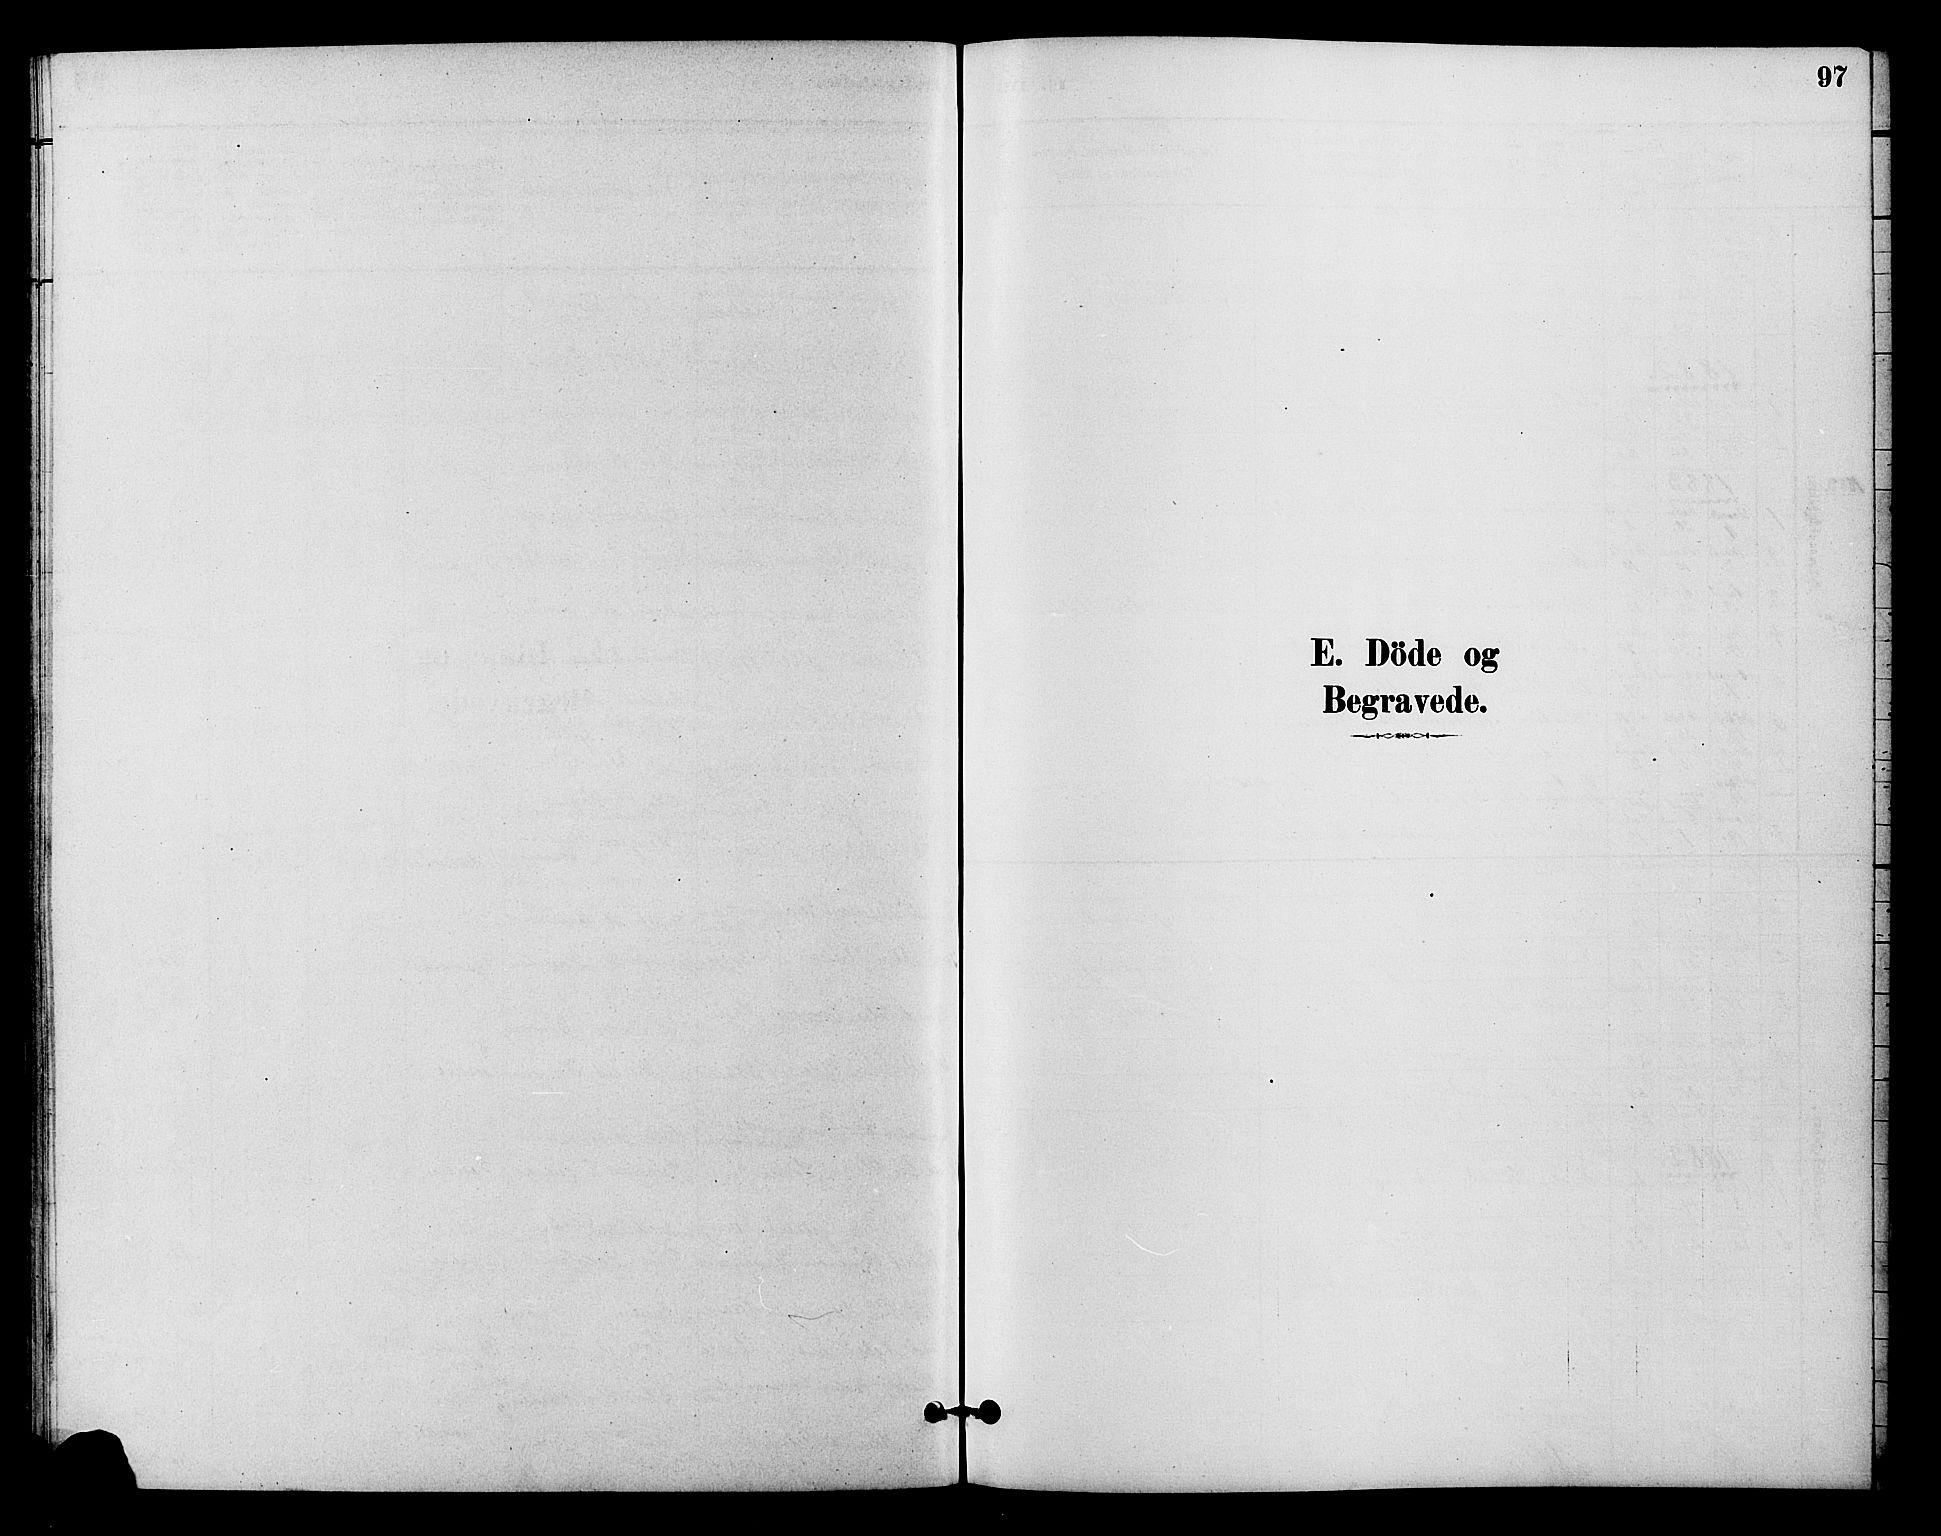 SAH, Vestre Slidre prestekontor, Klokkerbok nr. 4, 1881-1912, s. 97